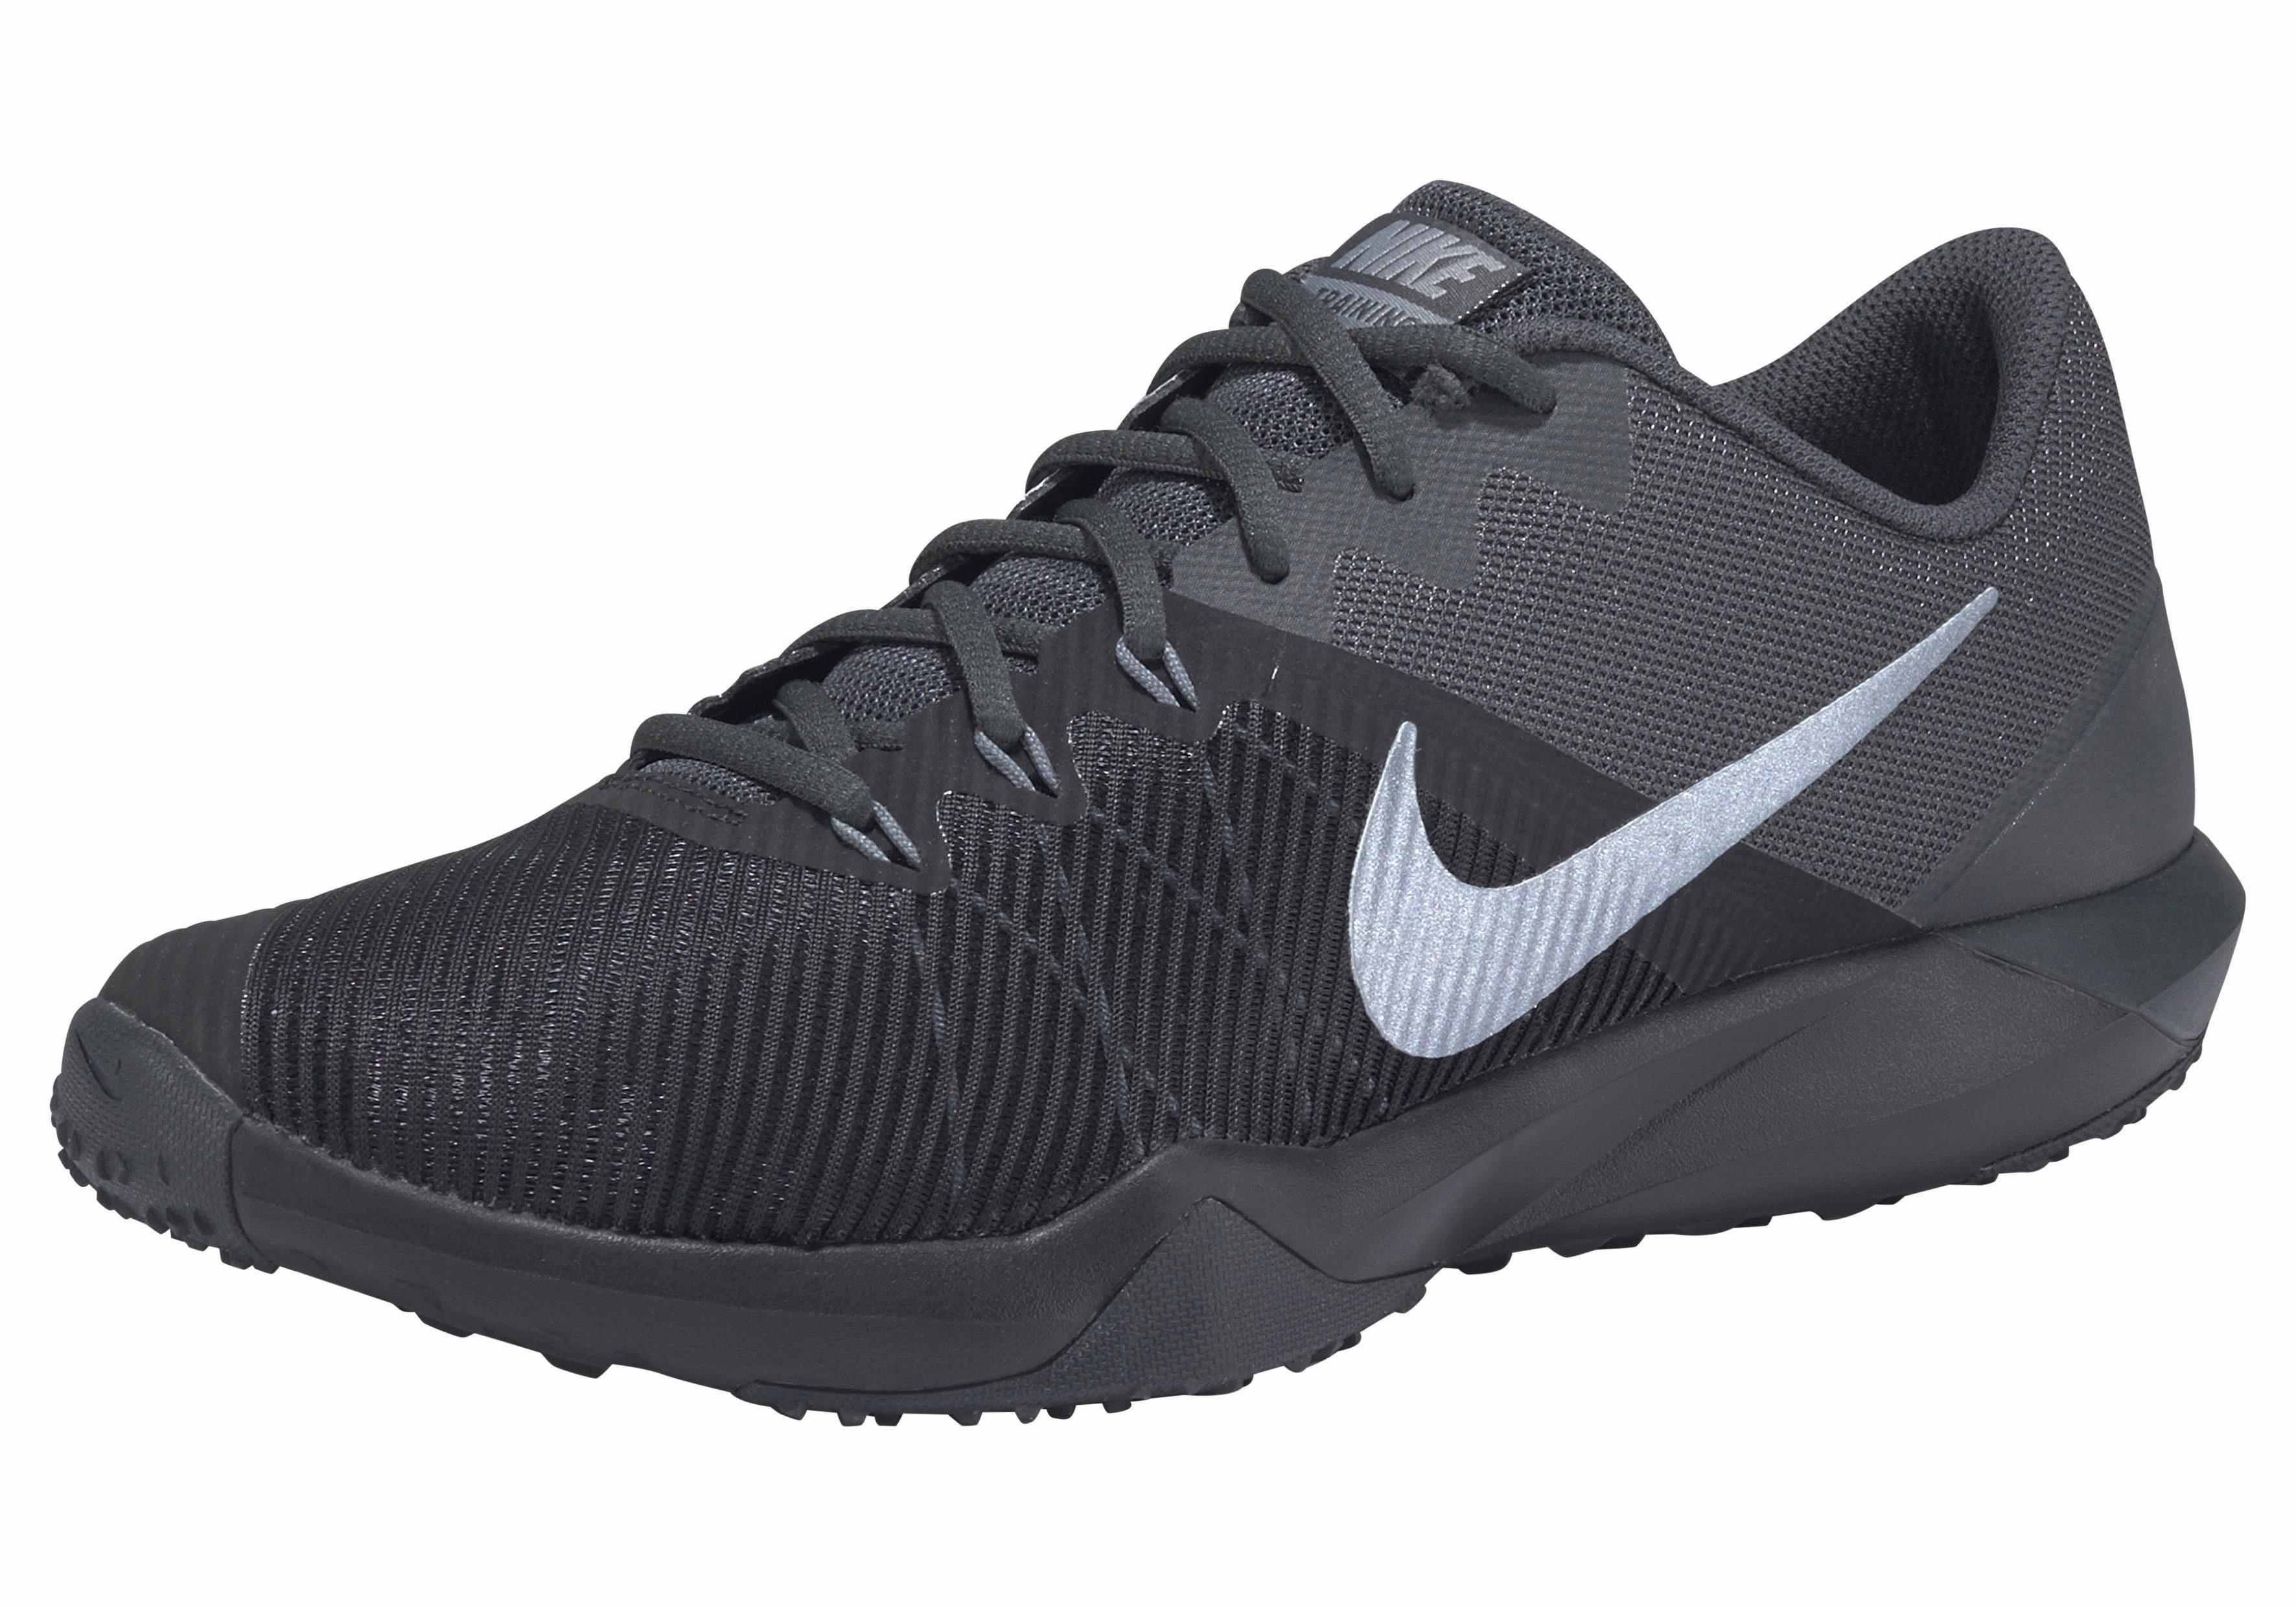 Nike Retaliation Trainer Trainingsschuh kaufen   OTTO Explosive Ware